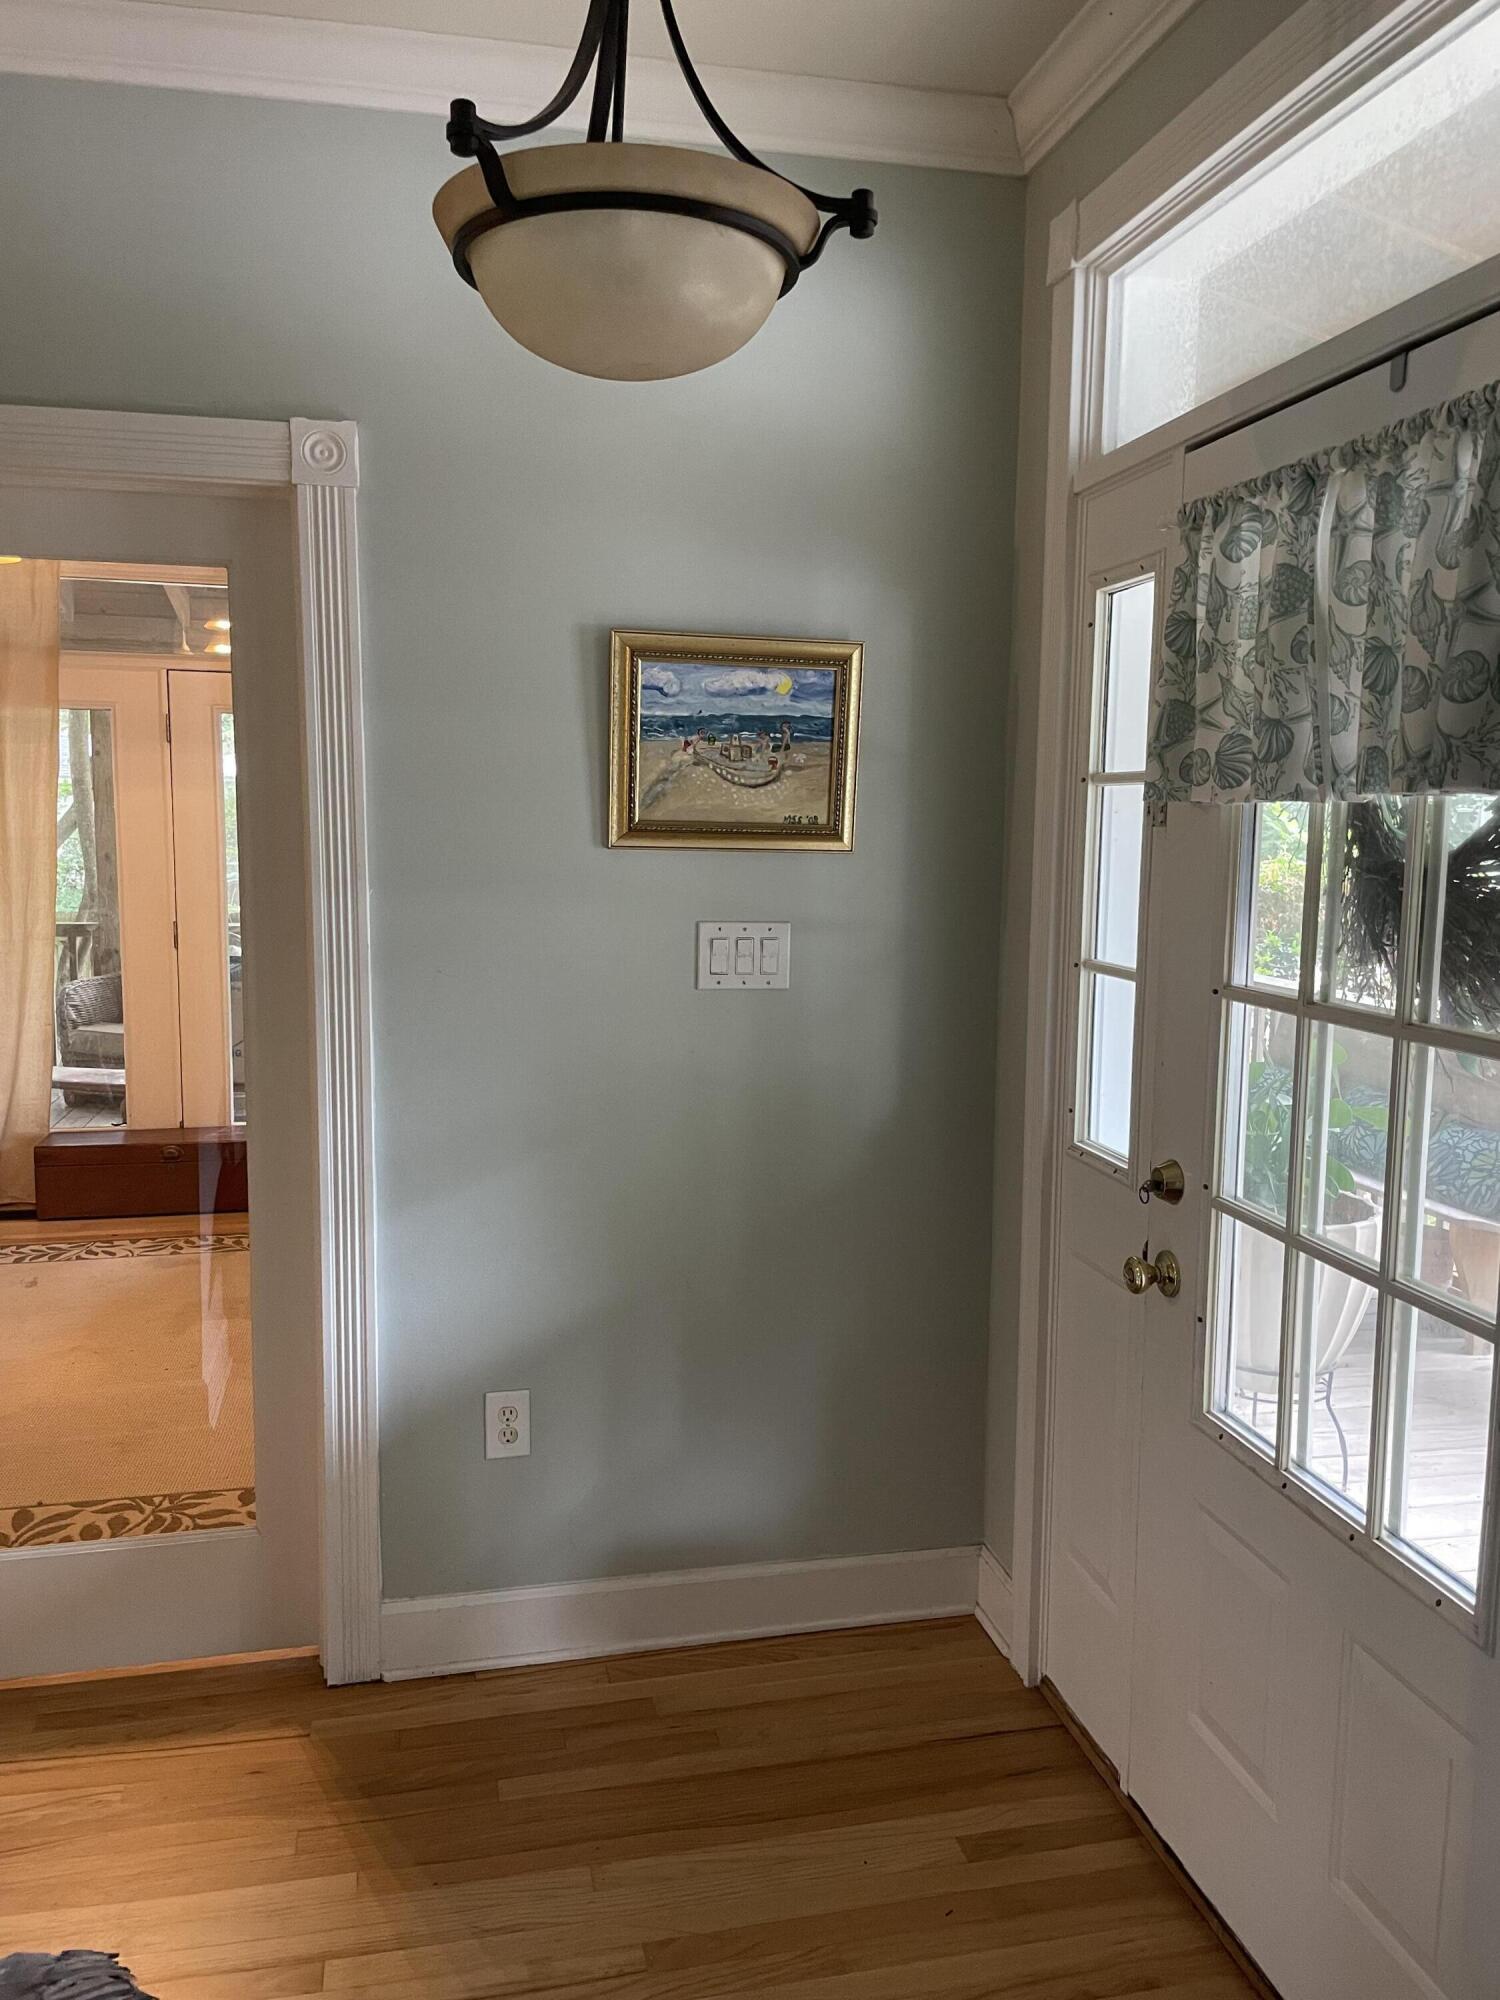 Old Mt Pleasant Homes For Sale - 703 Atlantic, Mount Pleasant, SC - 8